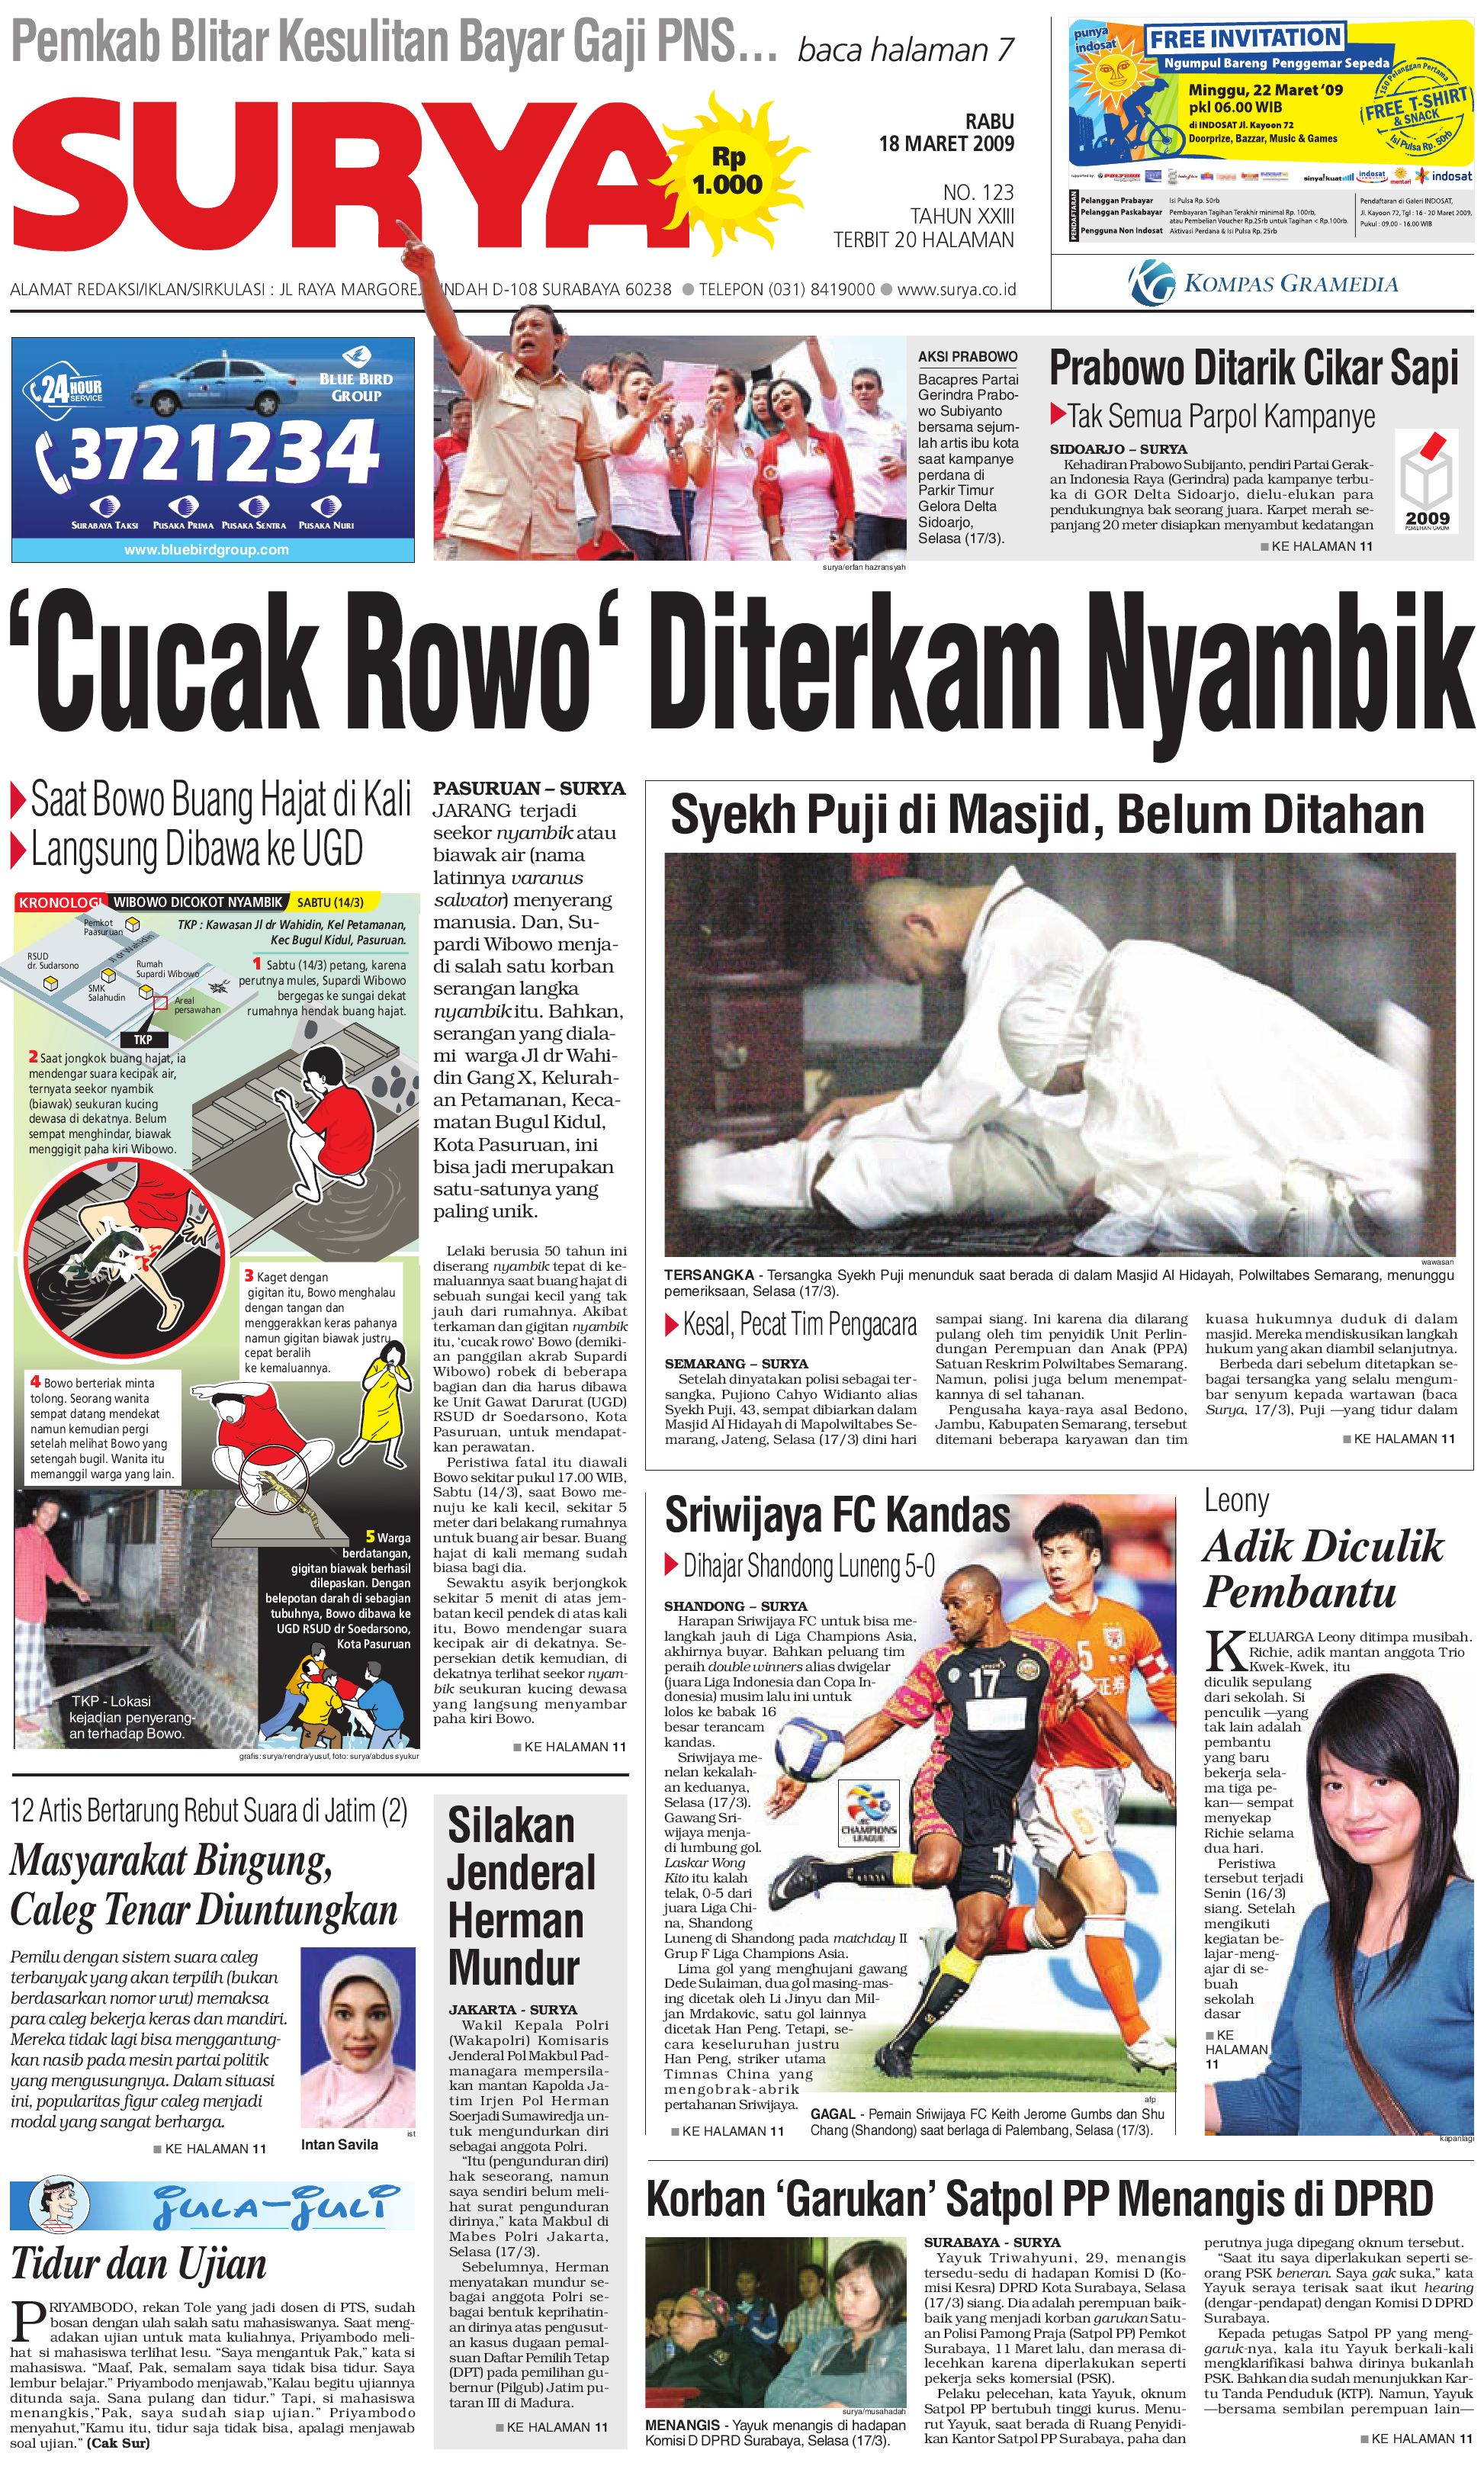 Harian Surya Edisi Cetak 18 Maret 2009 By Issuu Produk Ukm Bumn Tekiro Tang Buaya 10